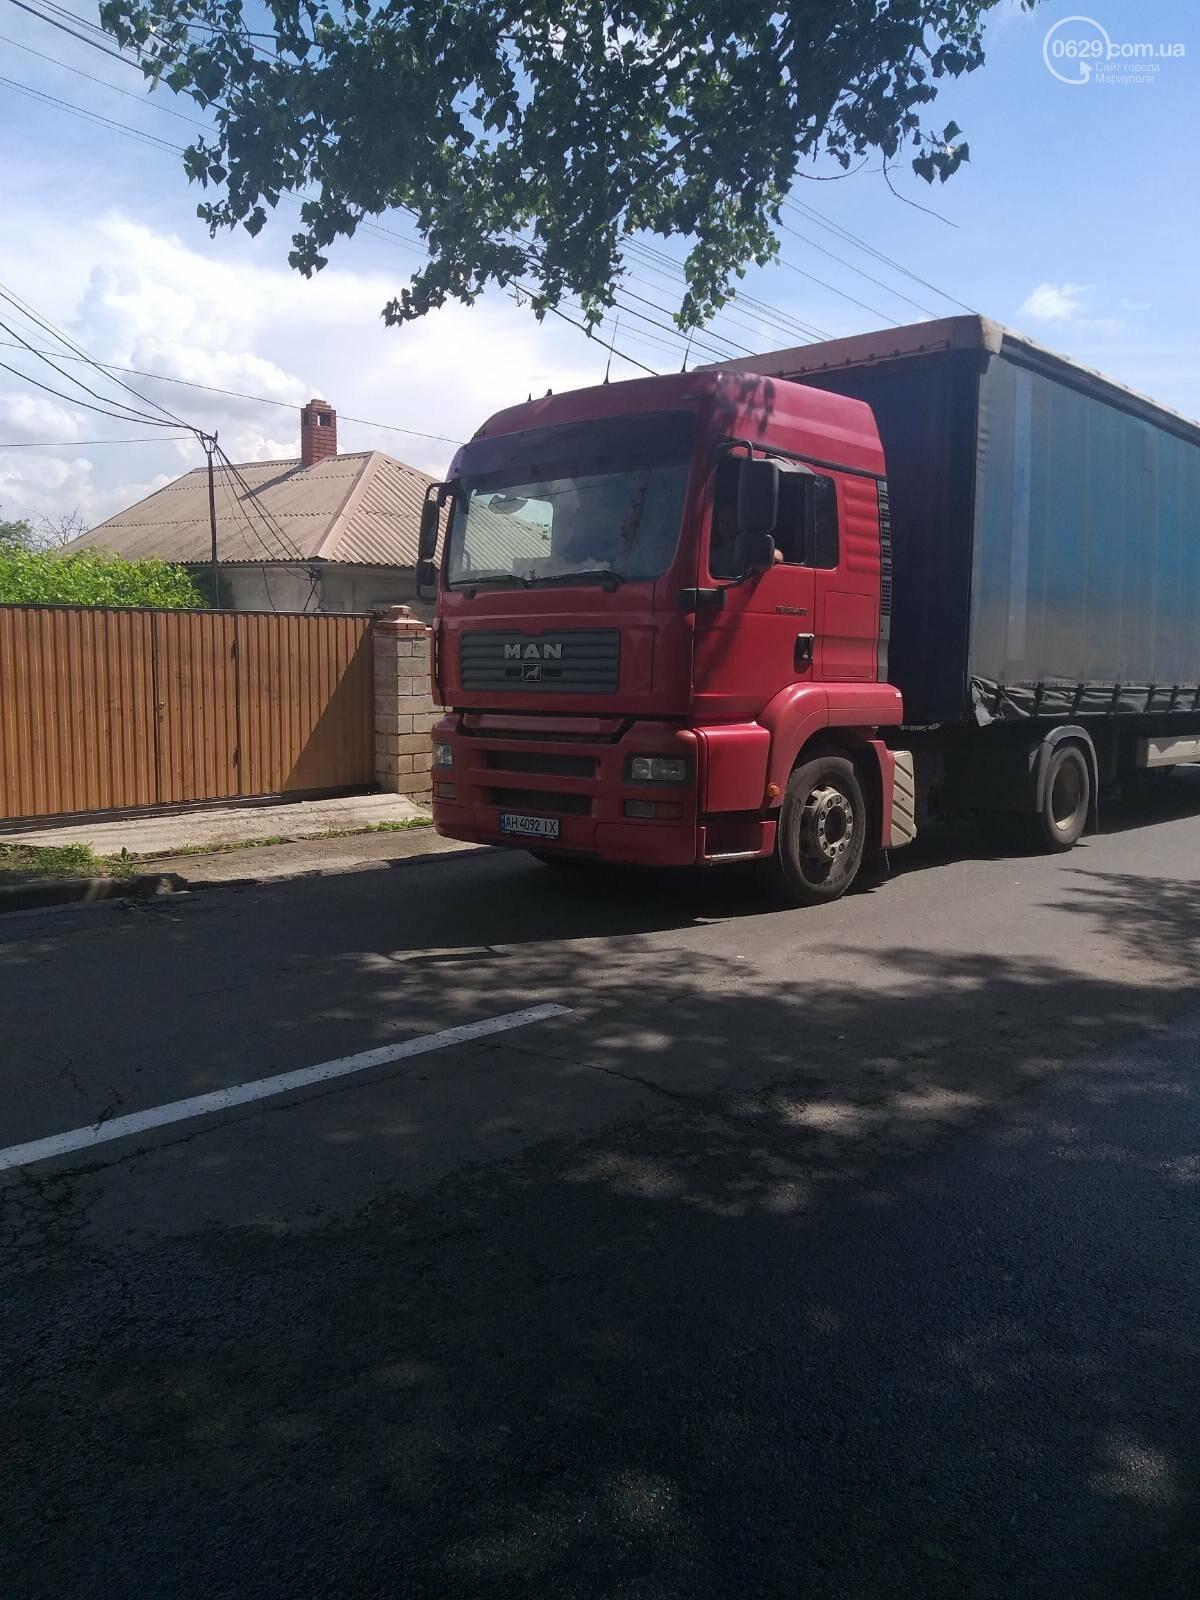 На ММКИ опровергли информацию о том, что транспорт предприятия разрушает улицу Бахмутскую, фото-1